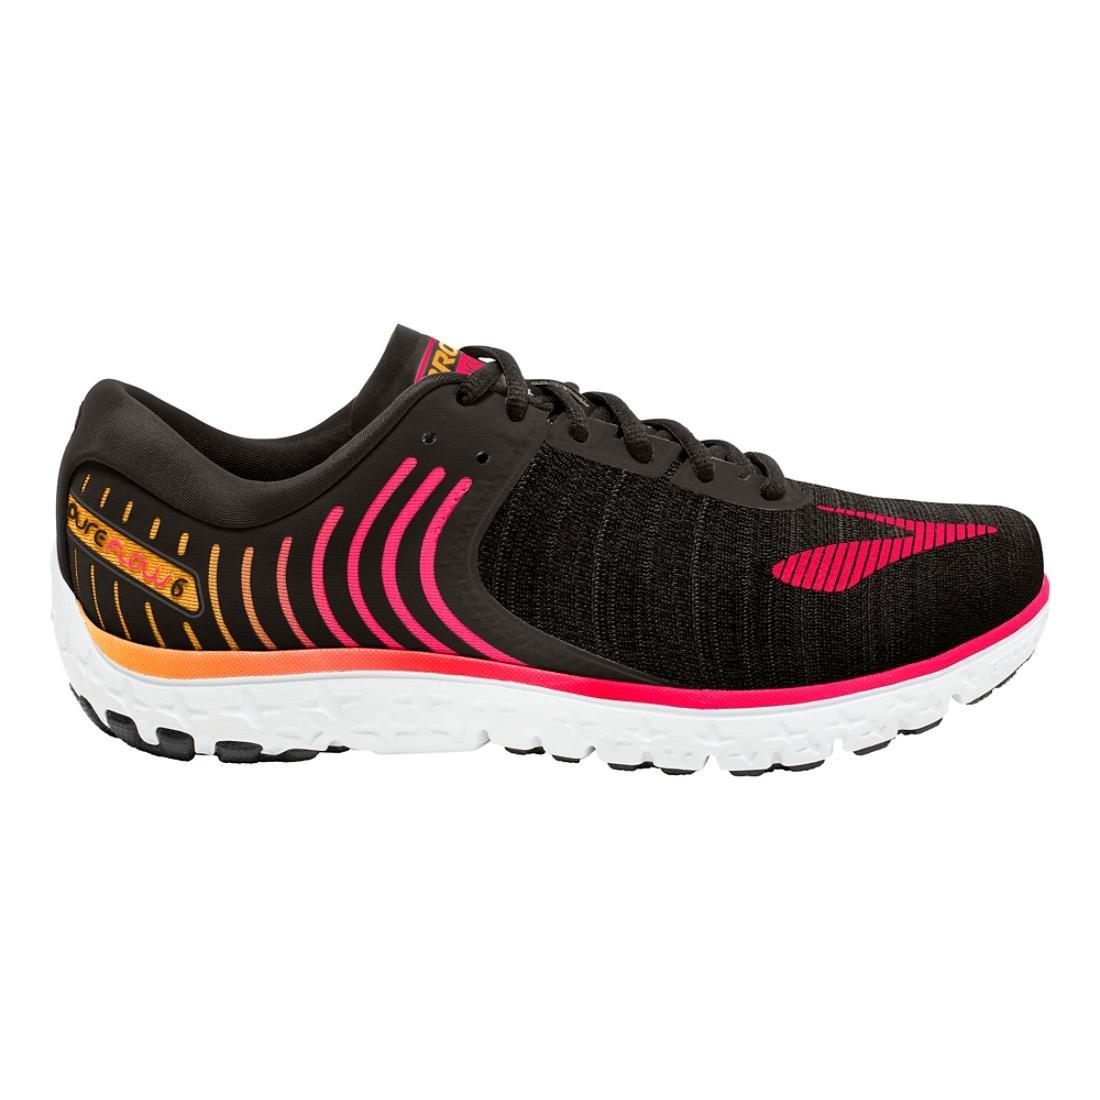 58eaf98676411 Brooks Women s PureFlow 6 Black Diva Pink Orange Pop Athletic Shoe  Amazon.in   Shoes   Handbags